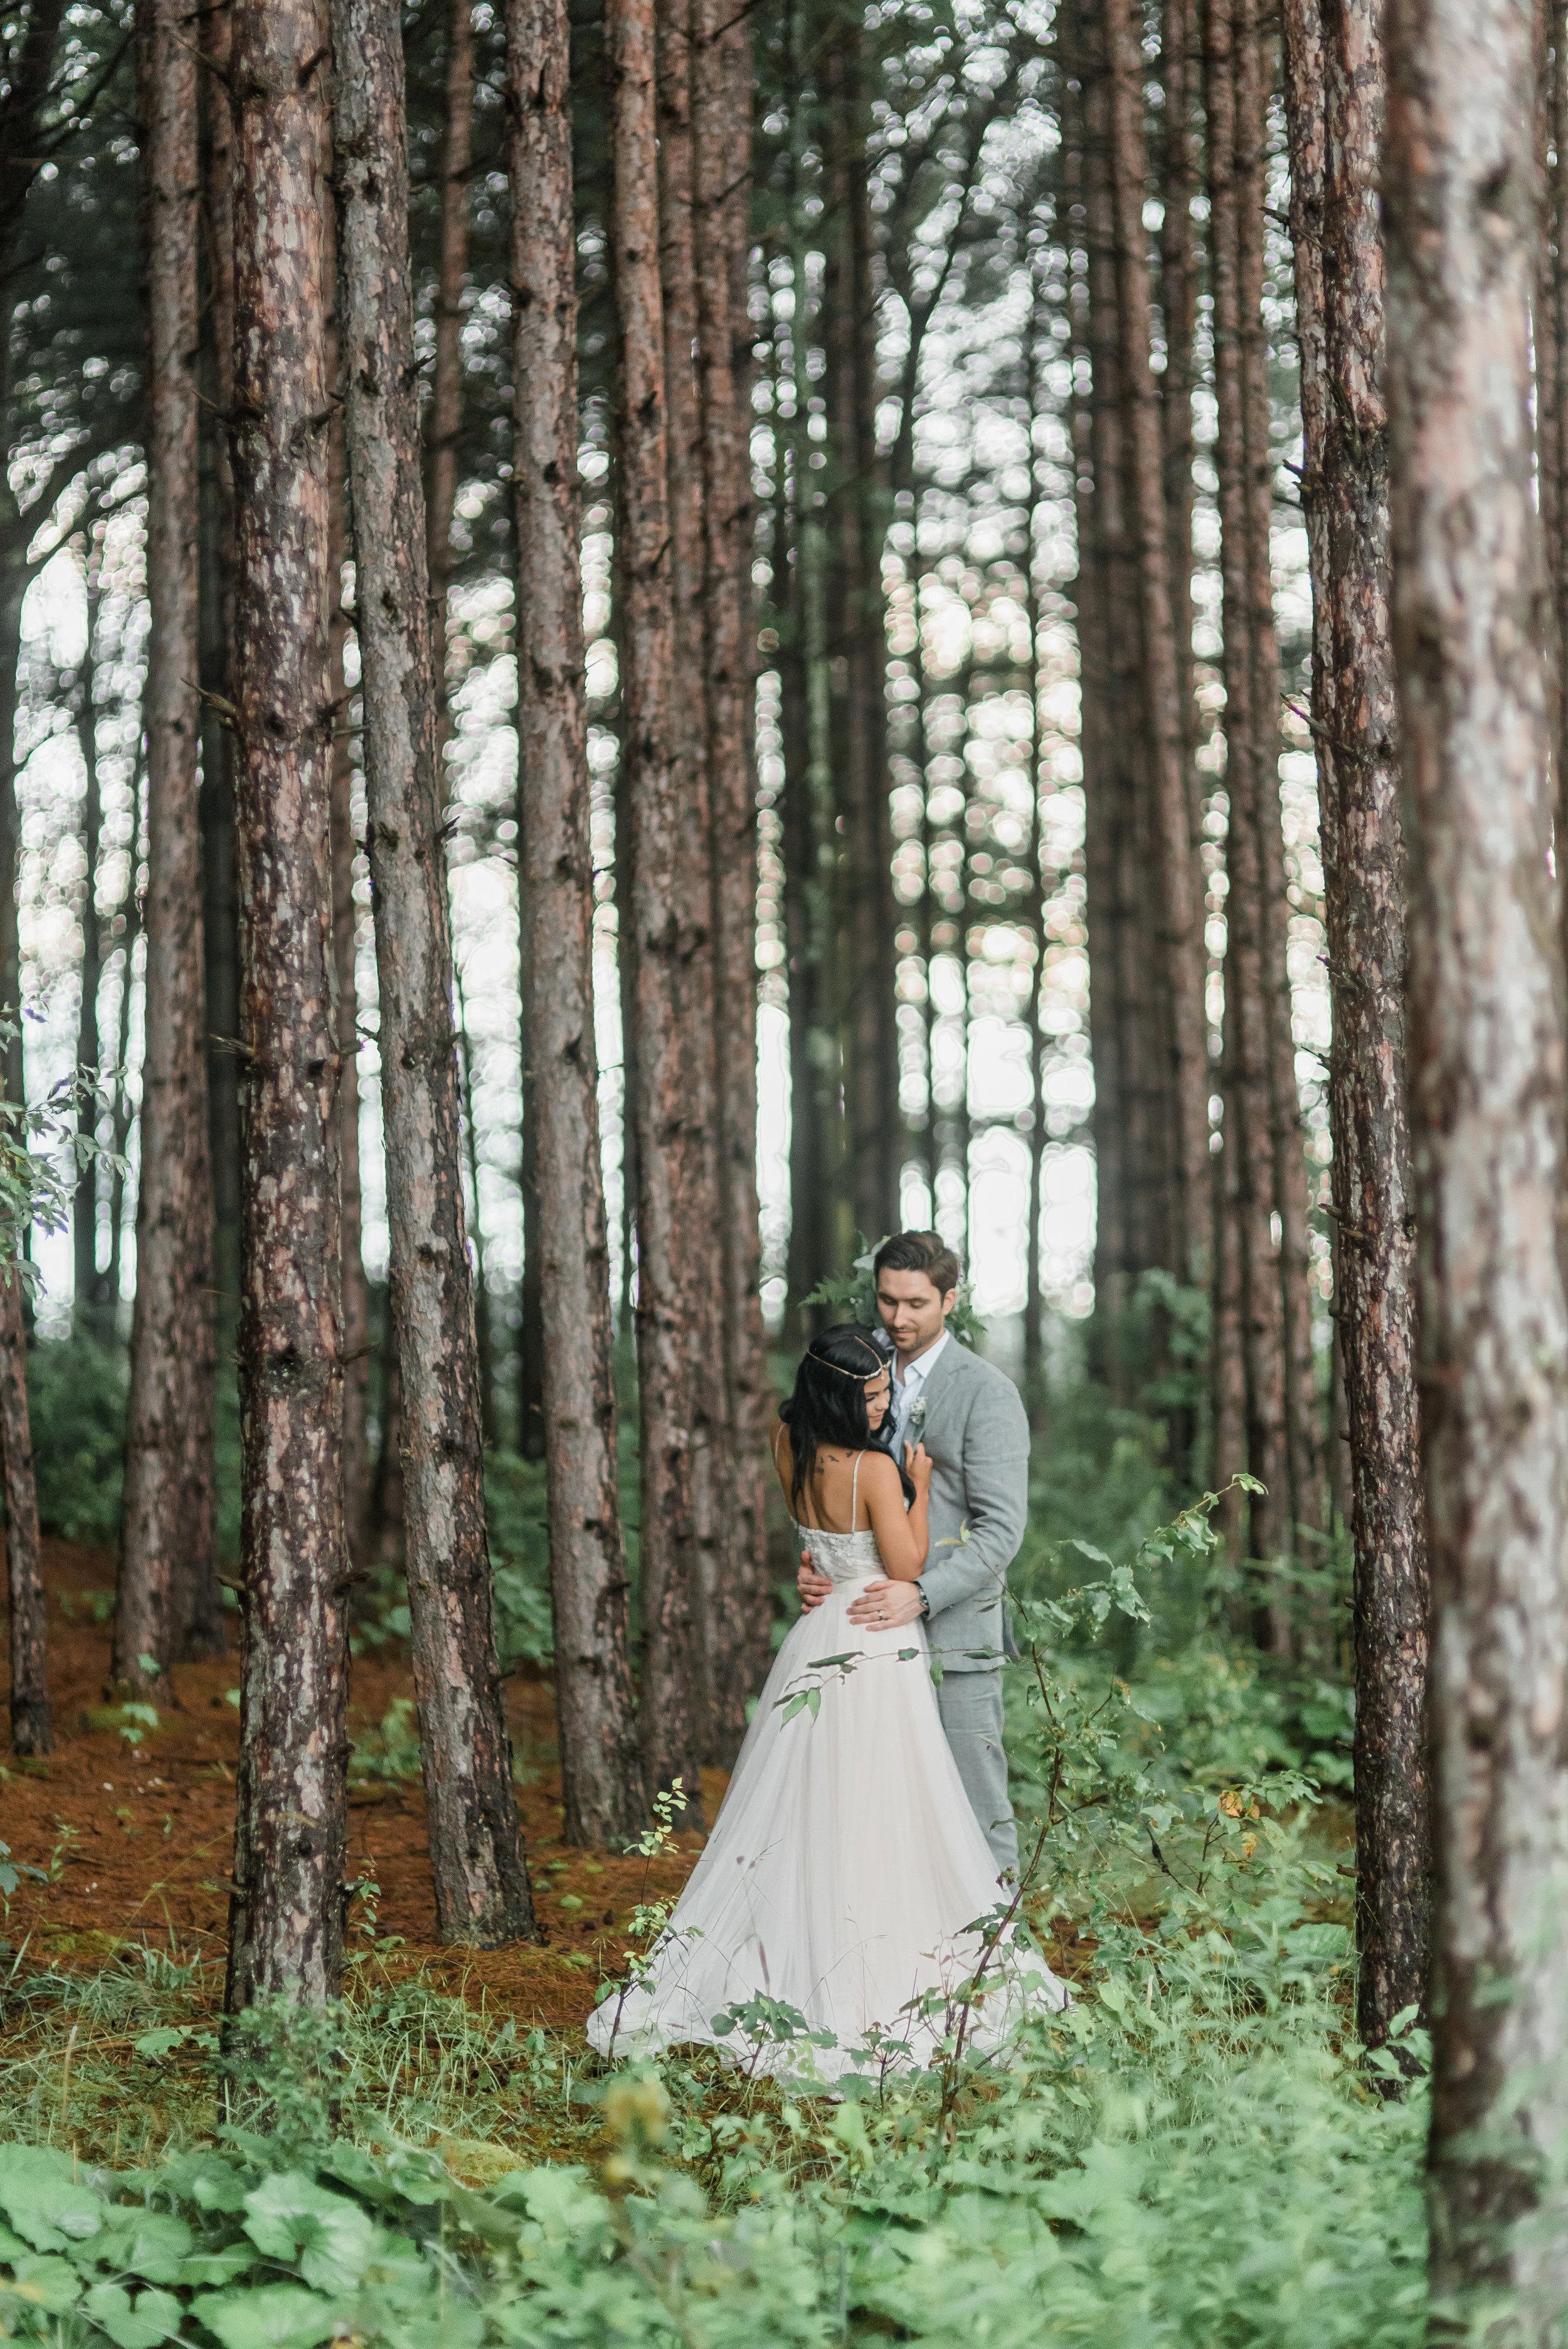 pittsburgh-wedding-photographer-horizonviewfarms-barn-farm-boho-vegan-chic0328.jpg